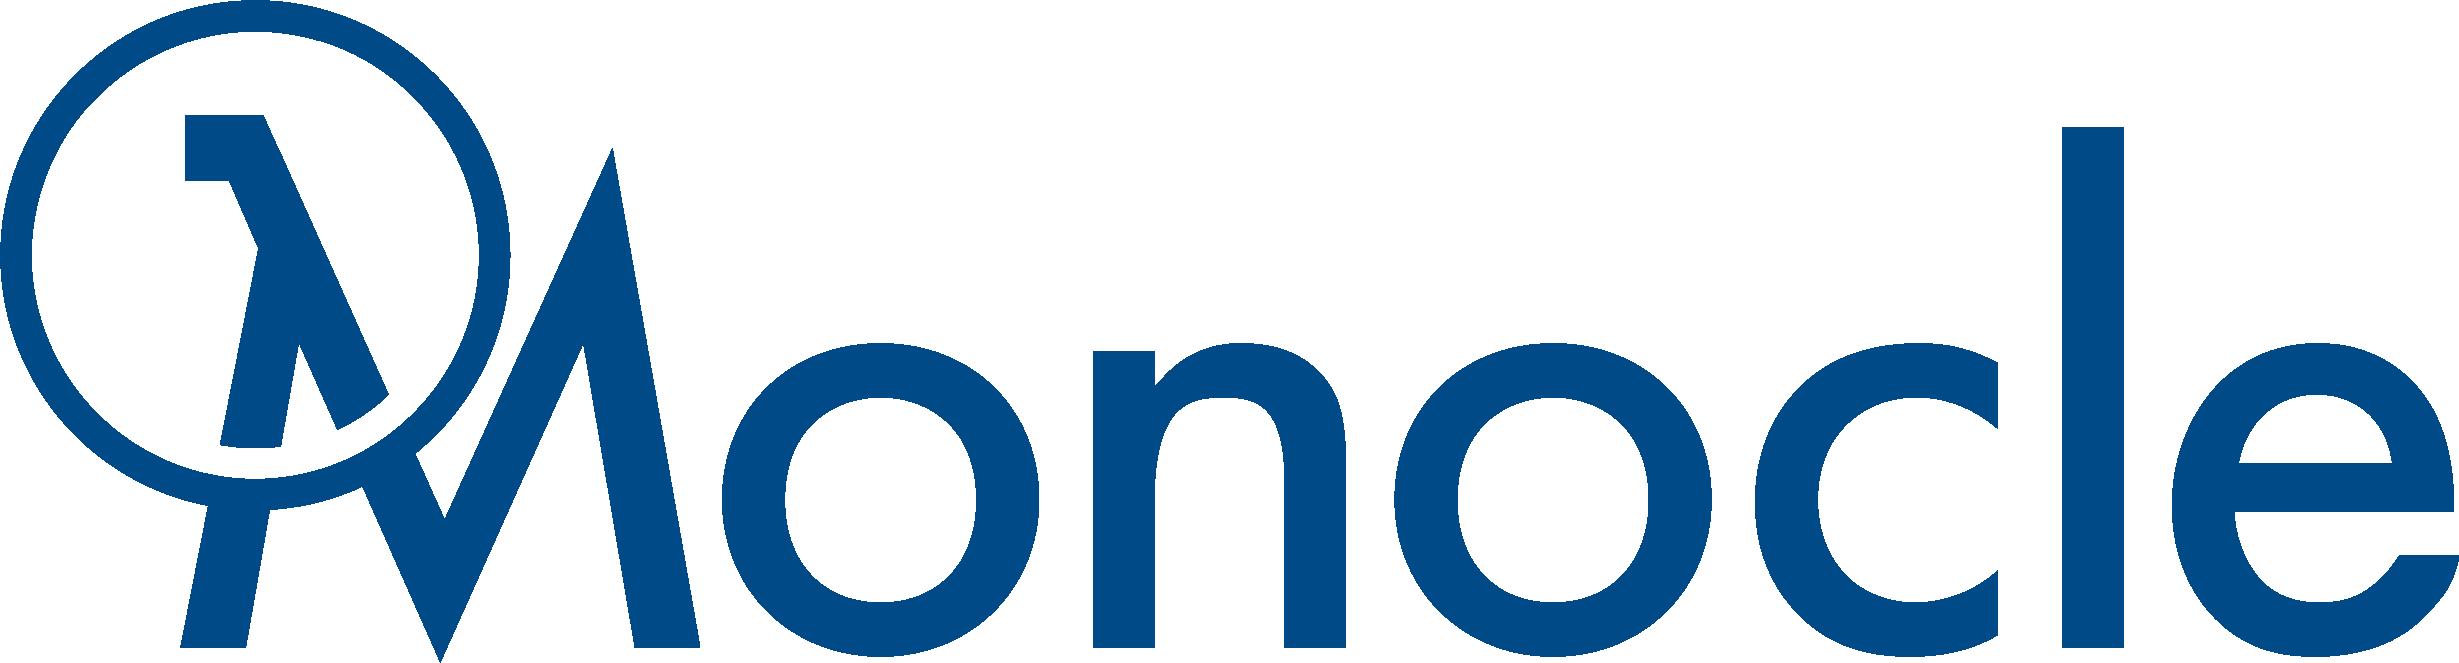 Monocle Logo